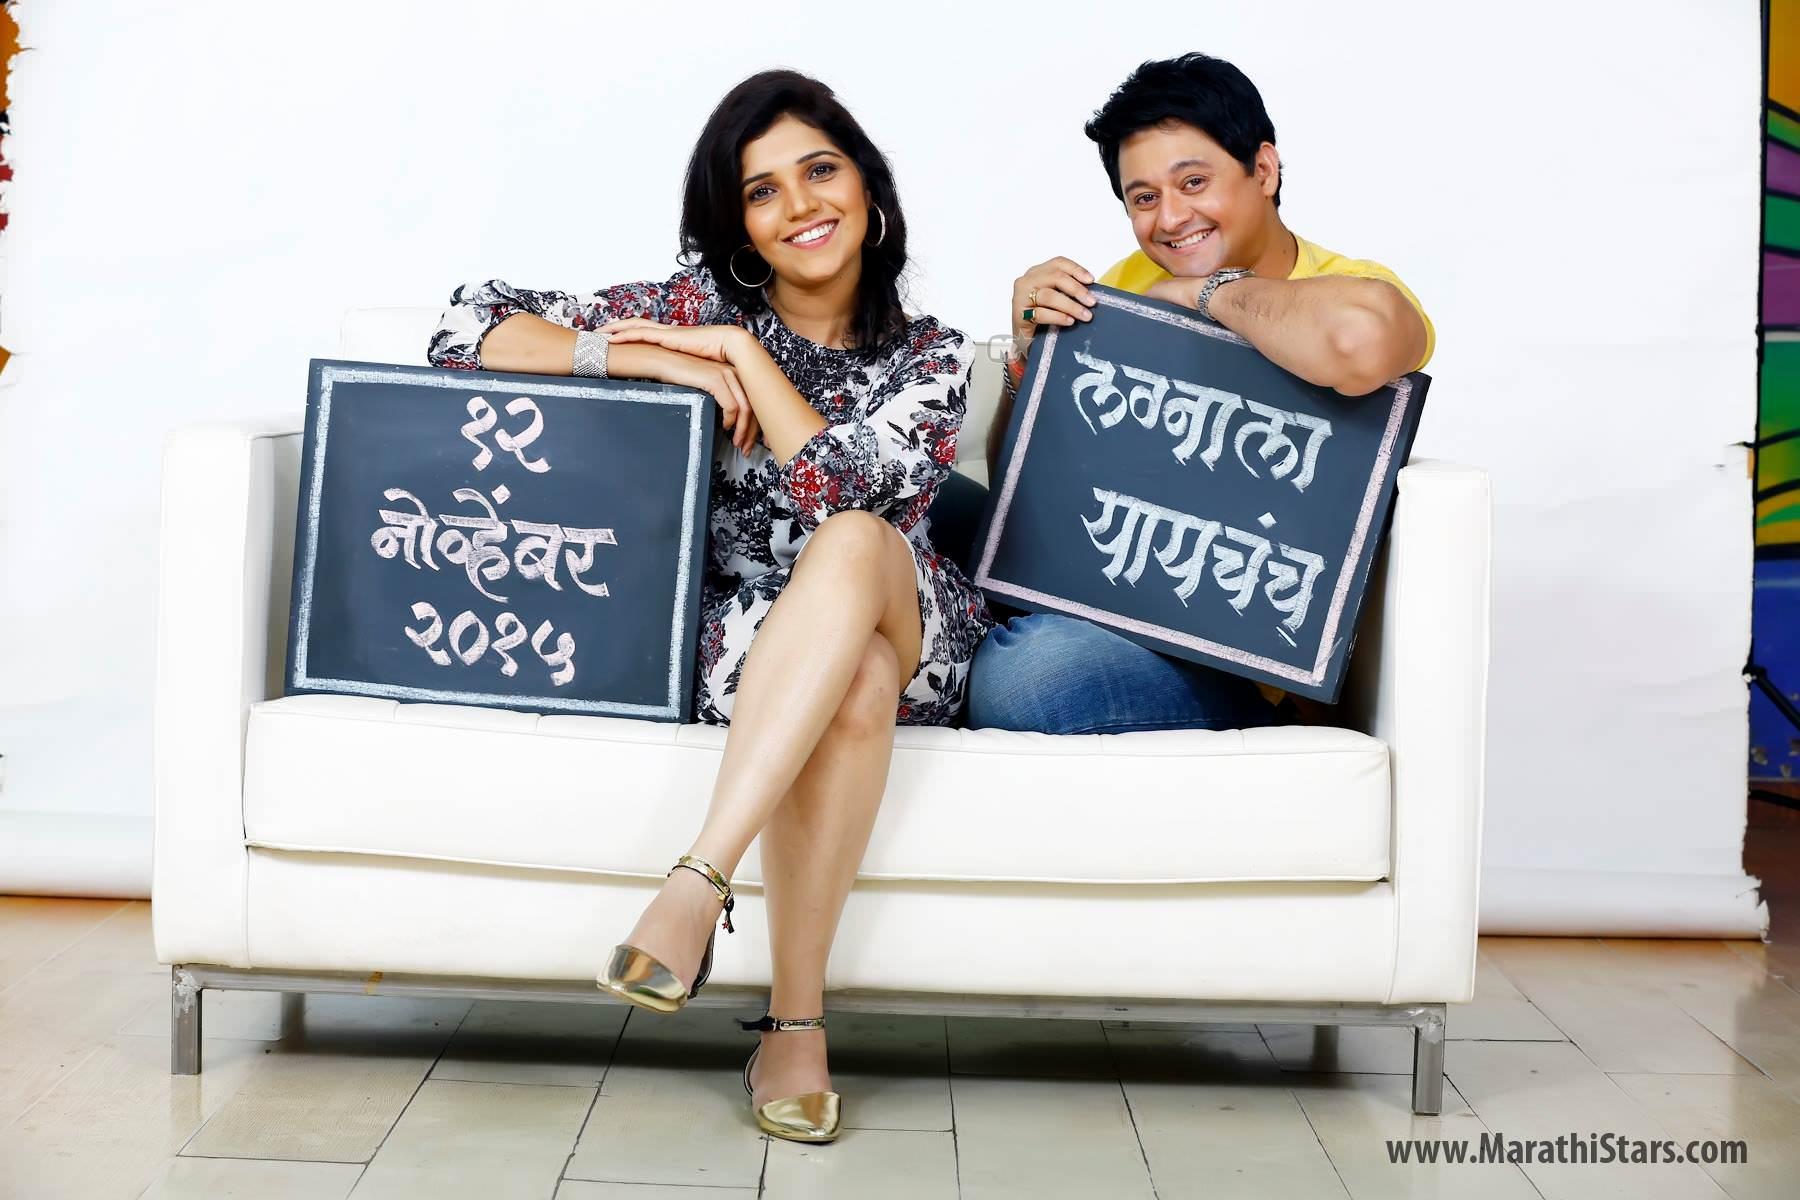 from Rafael marathi dating sites in mumbai